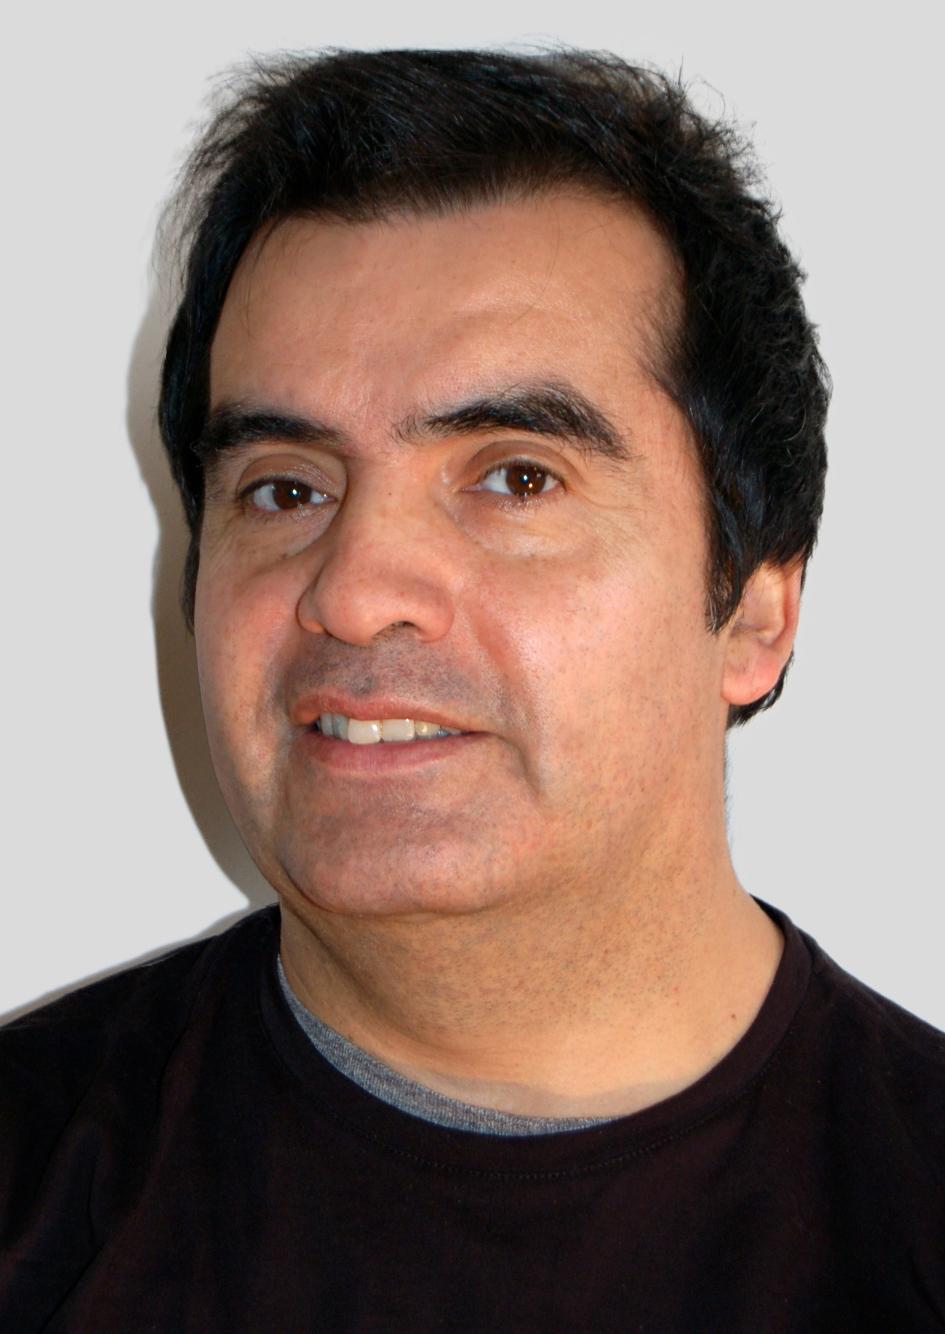 David Lara Pena